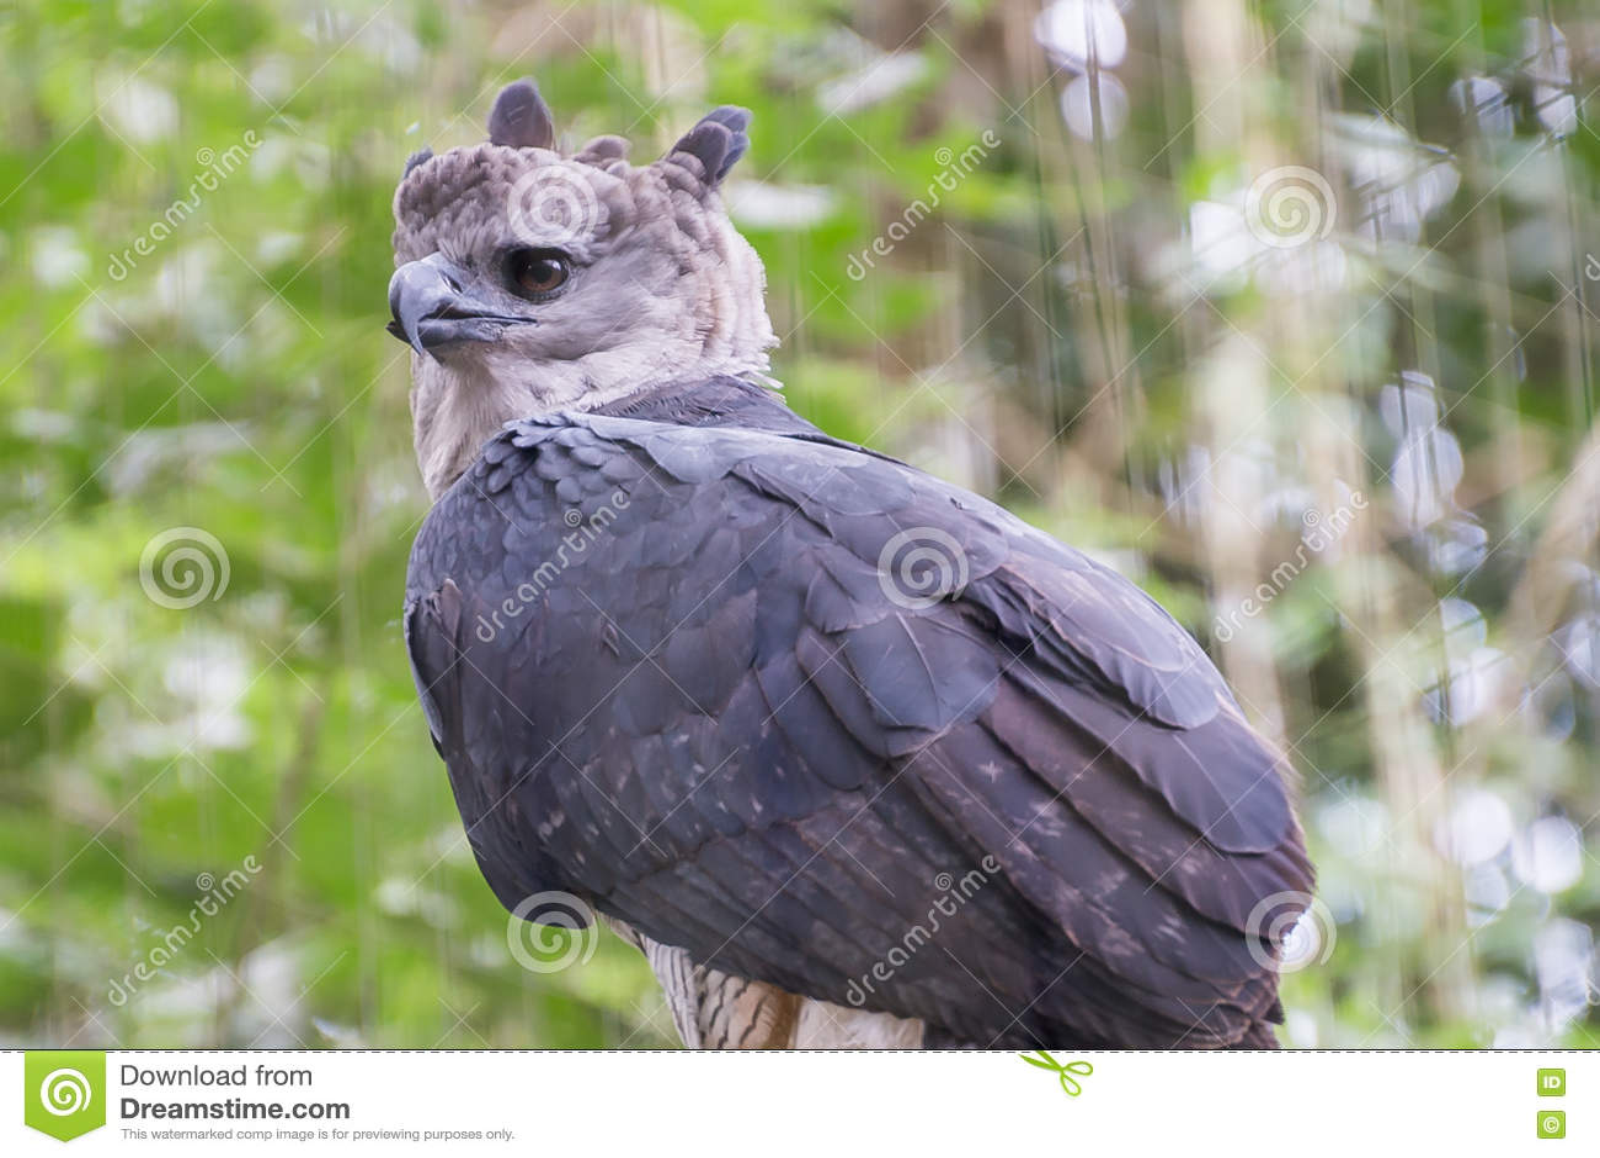 The majestic eagle harpy bird in Brazil